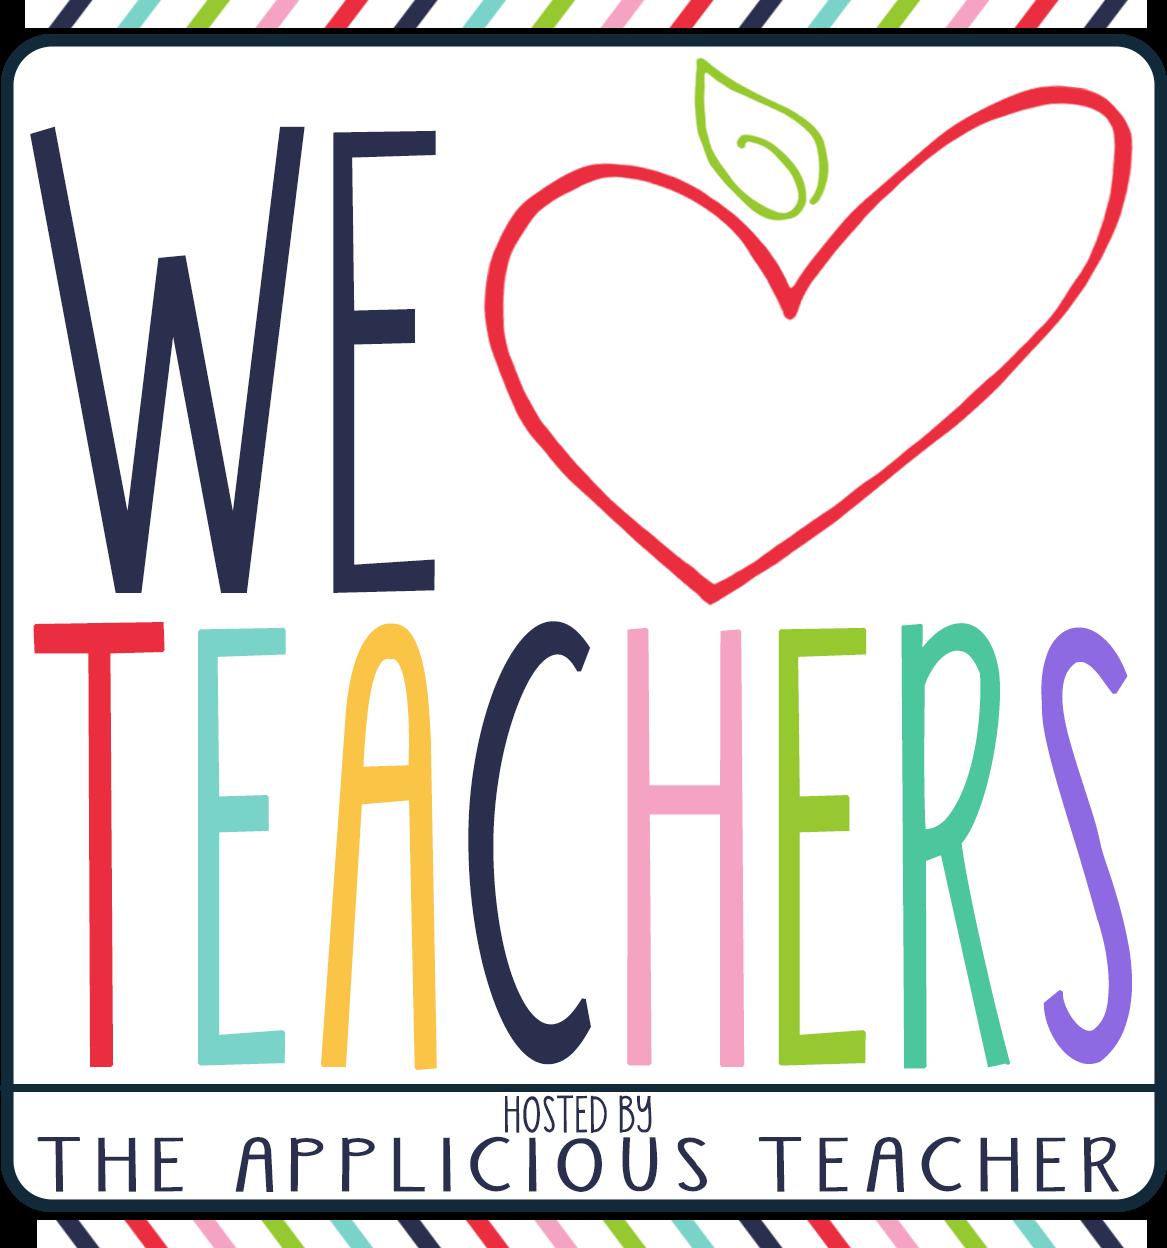 http://theappliciousteacher.blogspot.com/2014/05/we-heart-teachers-saluting-those-who.html